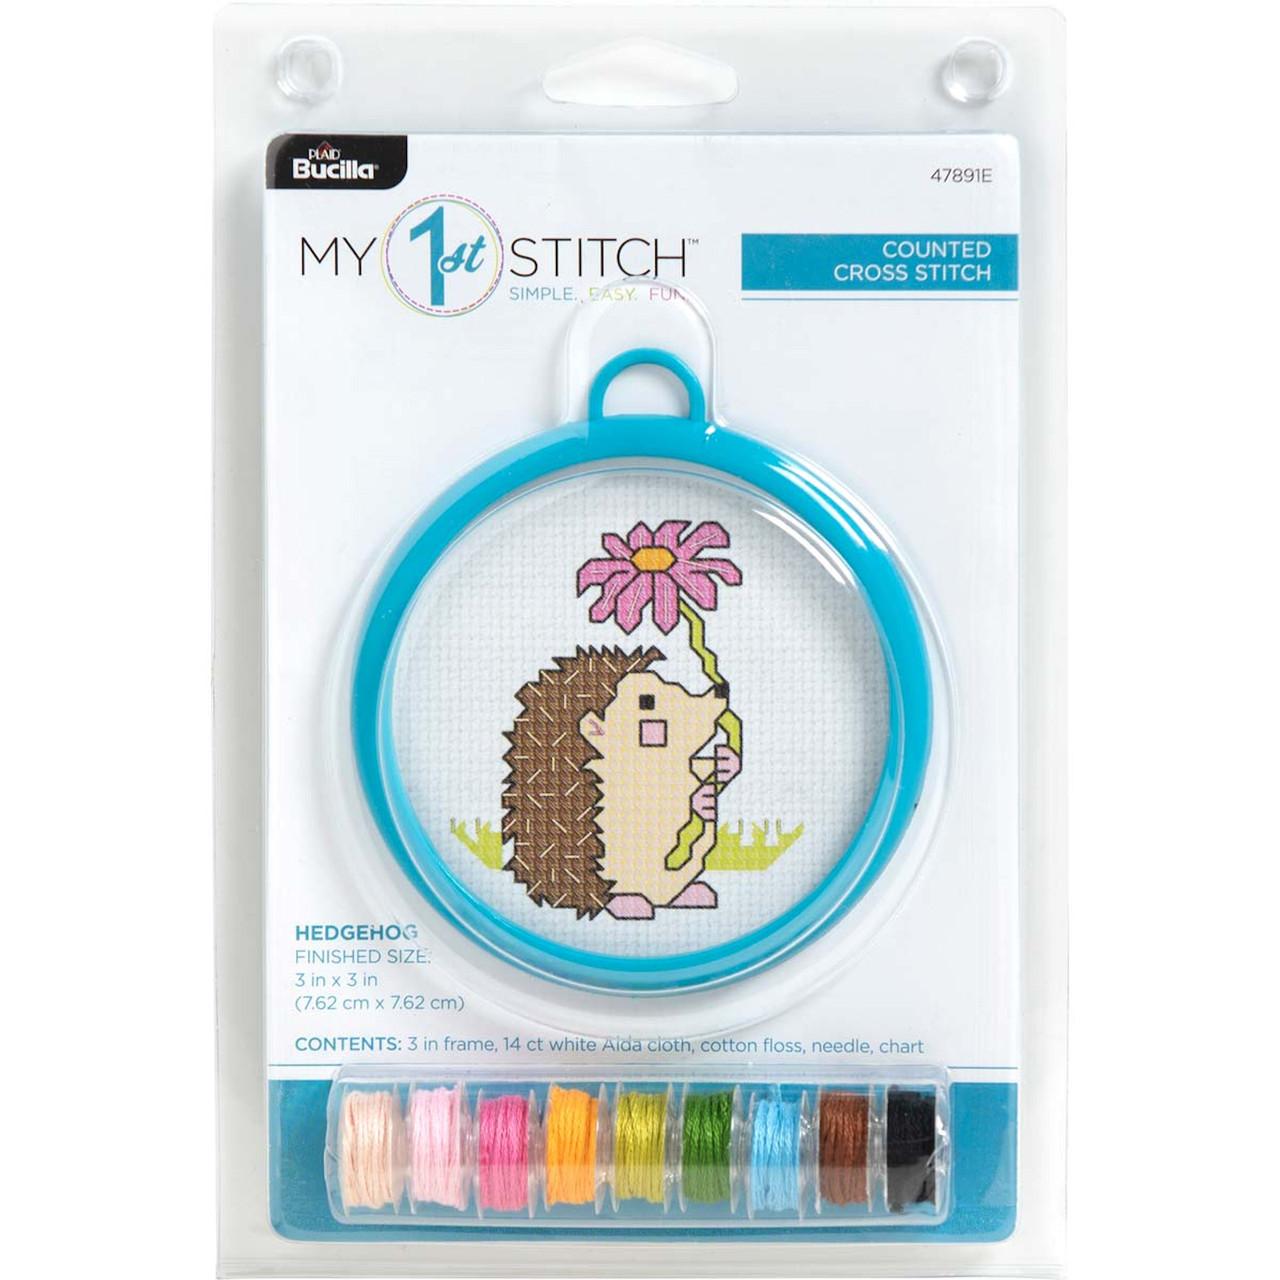 My 1st Stitch - Hedgehog